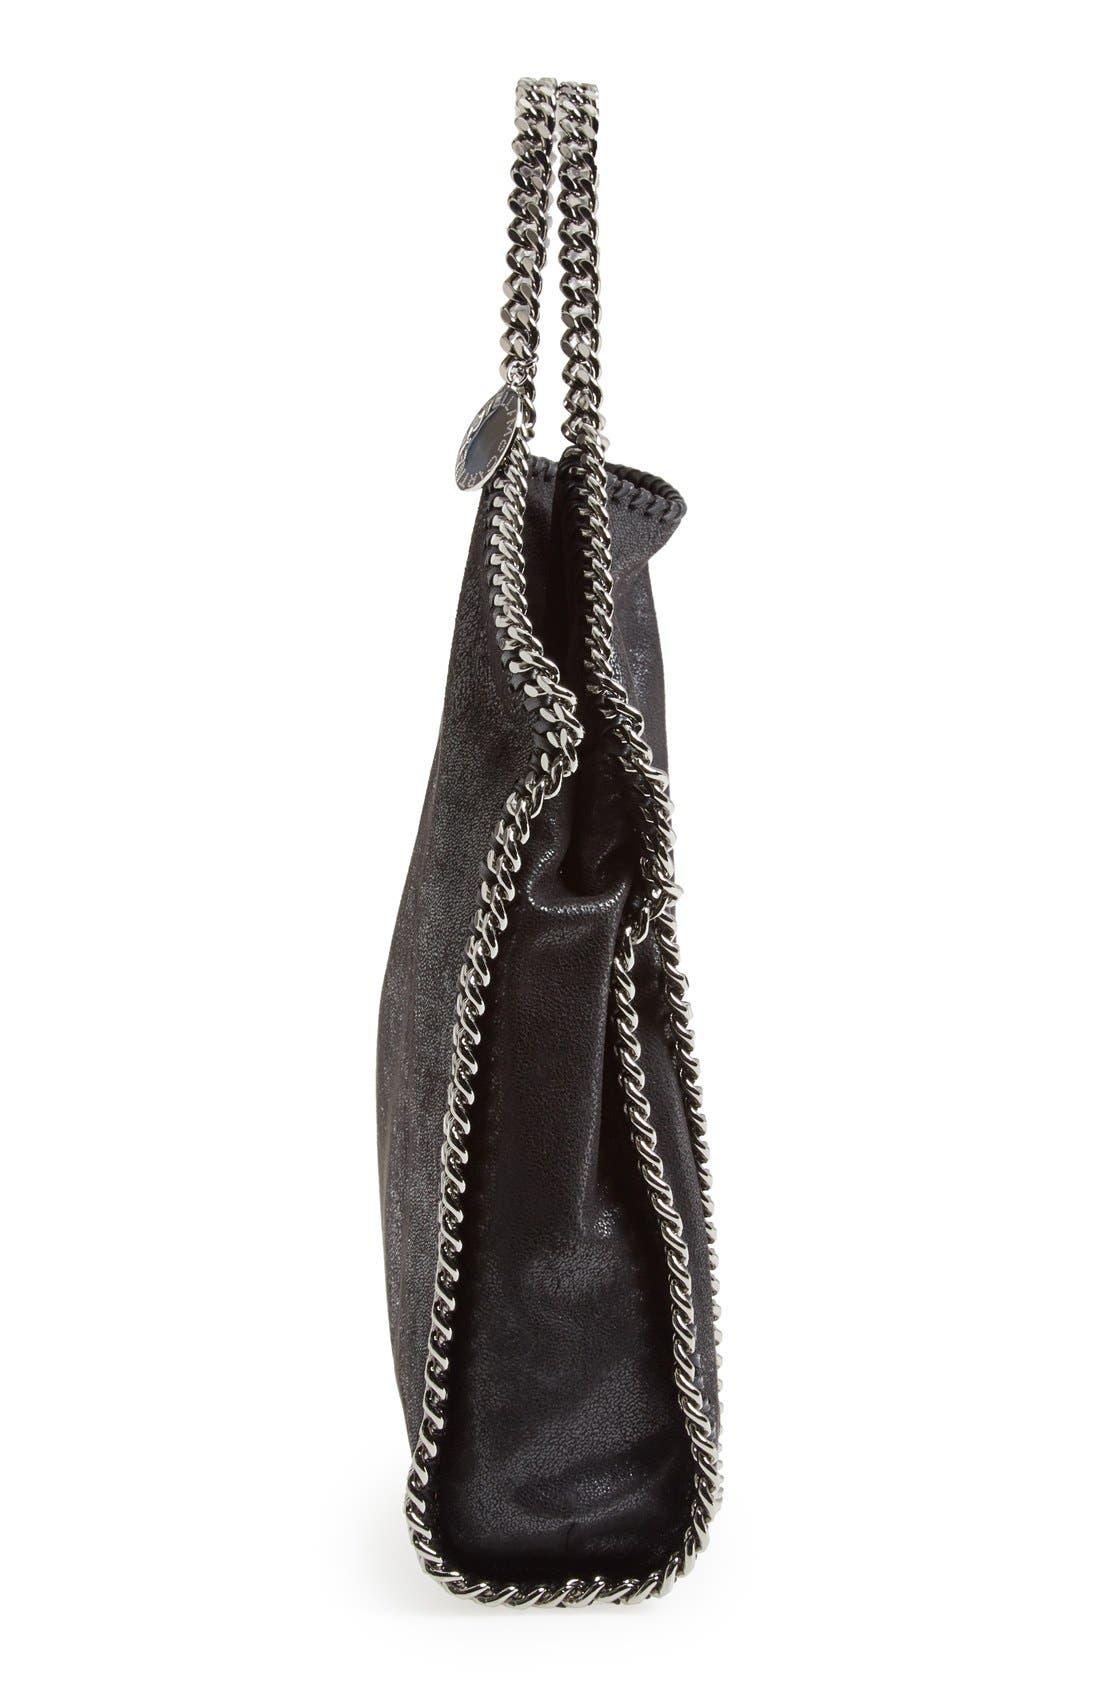 STELLA MCCARTNEY, 'Falabella - Shaggy Deer' Faux Leather Foldover Tote, Alternate thumbnail 2, color, BLACK